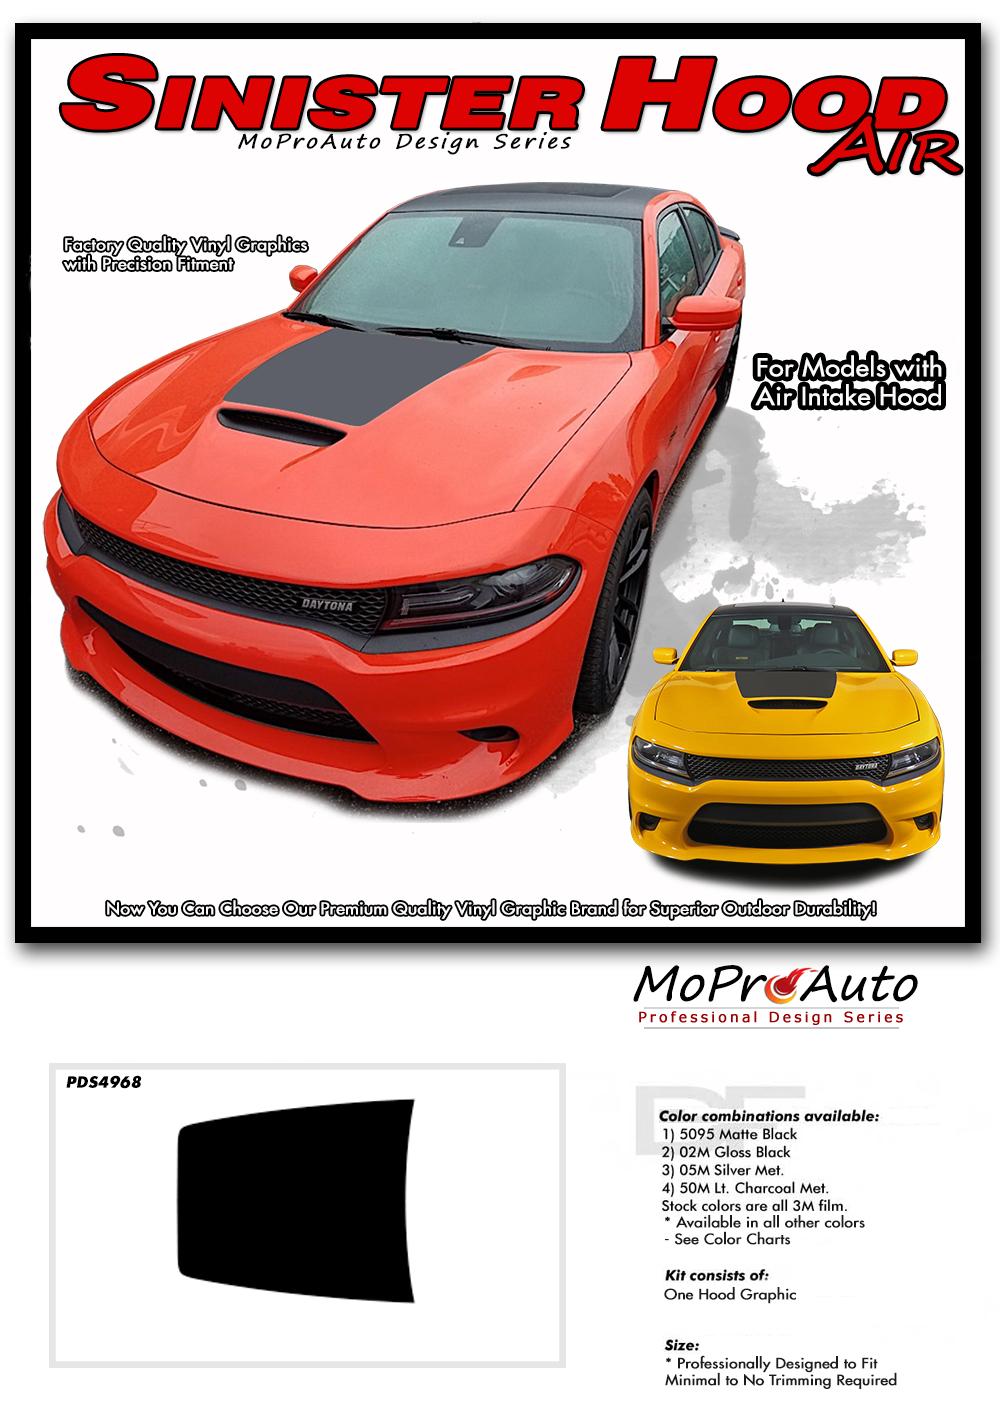 2015, 2016, 2017, 2018, 2019, 2020 SINISTER HOOD : Dodge Charger Daytona Hemi SRT 392 Style Center Air Hood Vinyl Graphic Decals and Stripe Kit